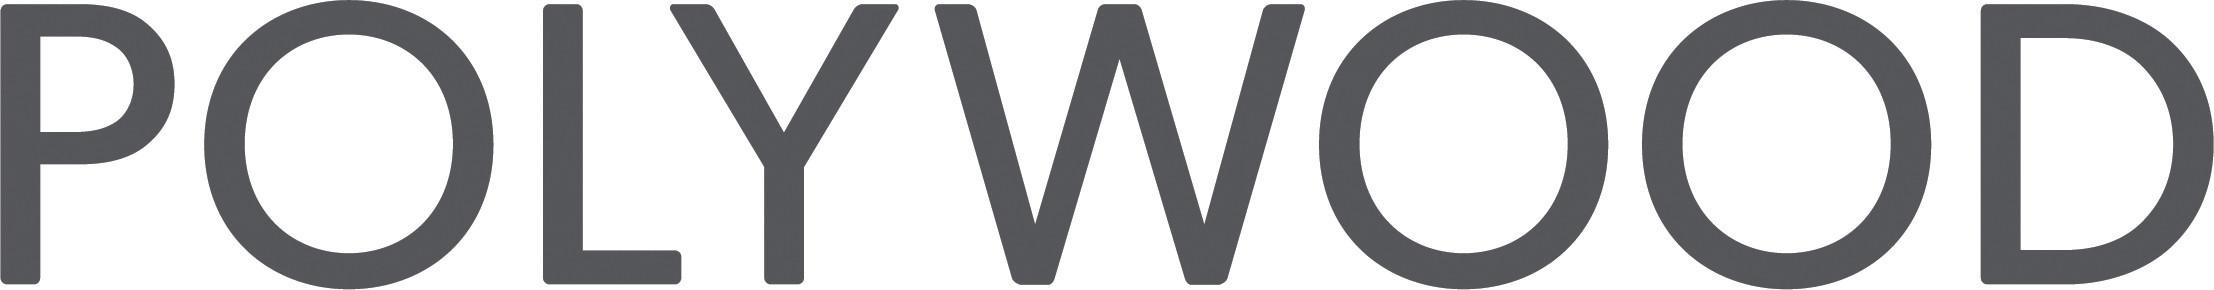 POLYWOOD-Logo-Gray-RGB